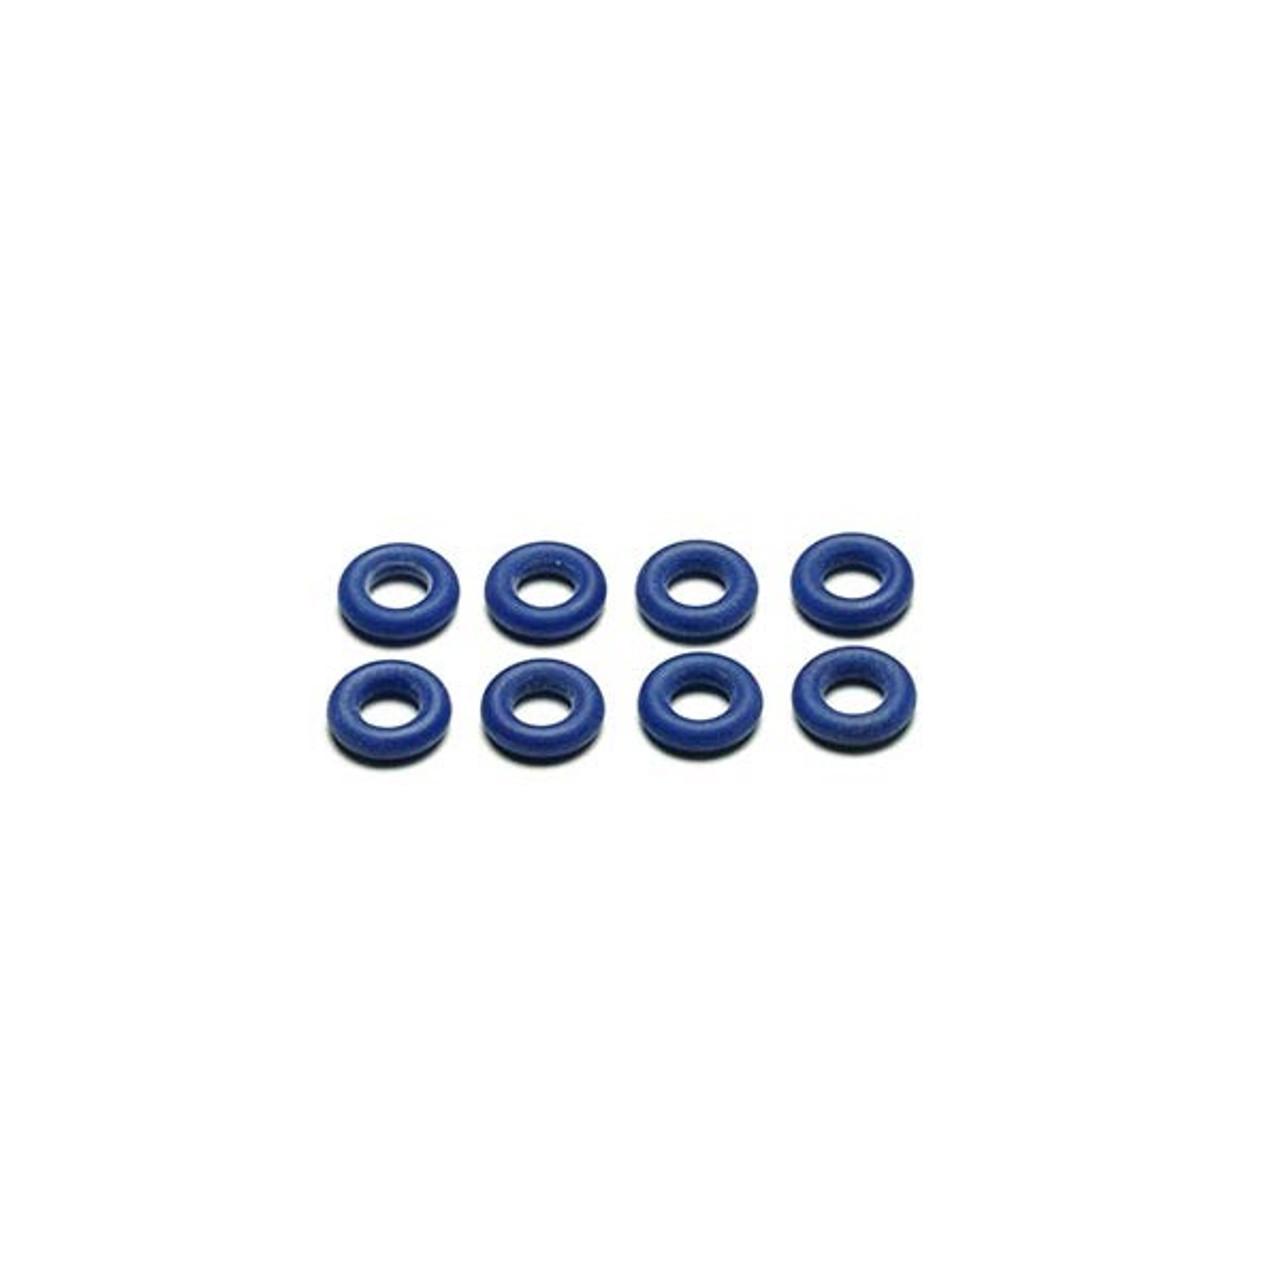 Damper O-ring - SBX SBXE Big Bore Shock (8)